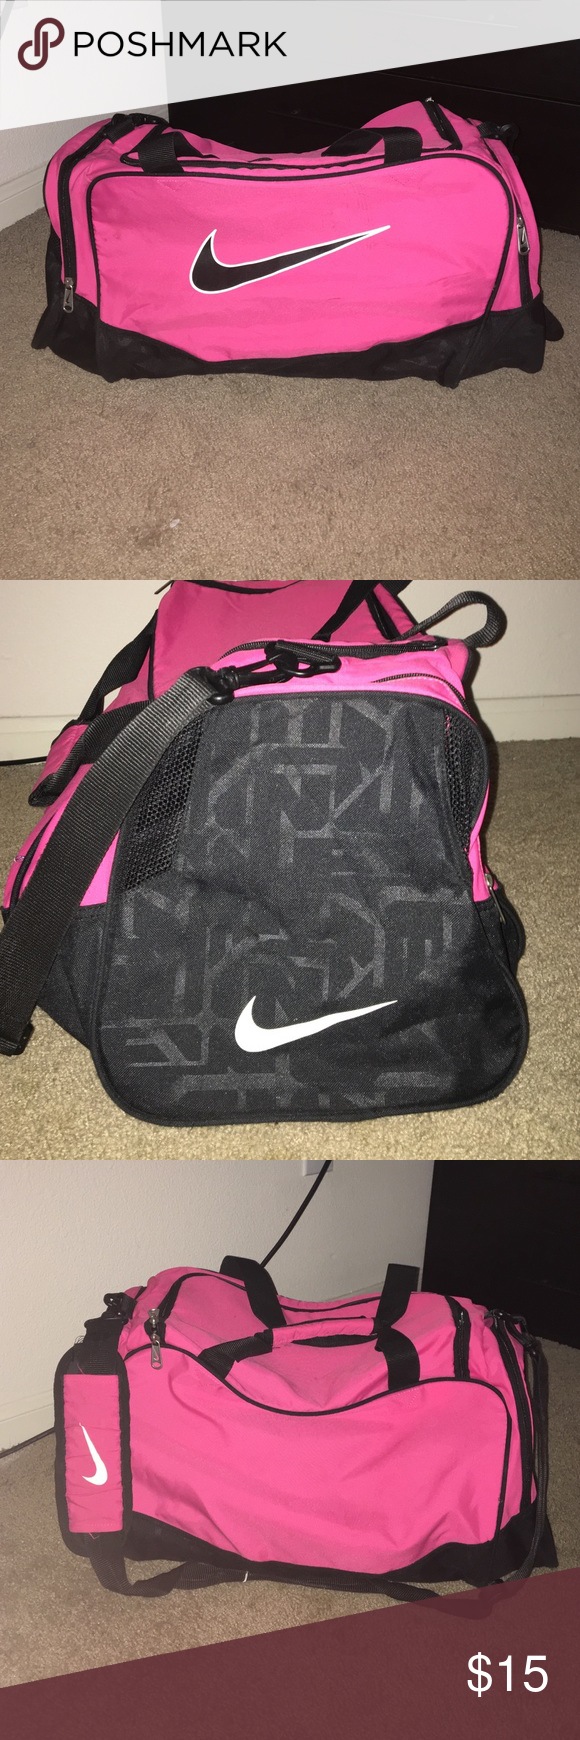 super popular e4ba7 cabc1 Nike Pink Gym Bag Large Nike pink gym bag with  three zipped ... 46d9b8c73f